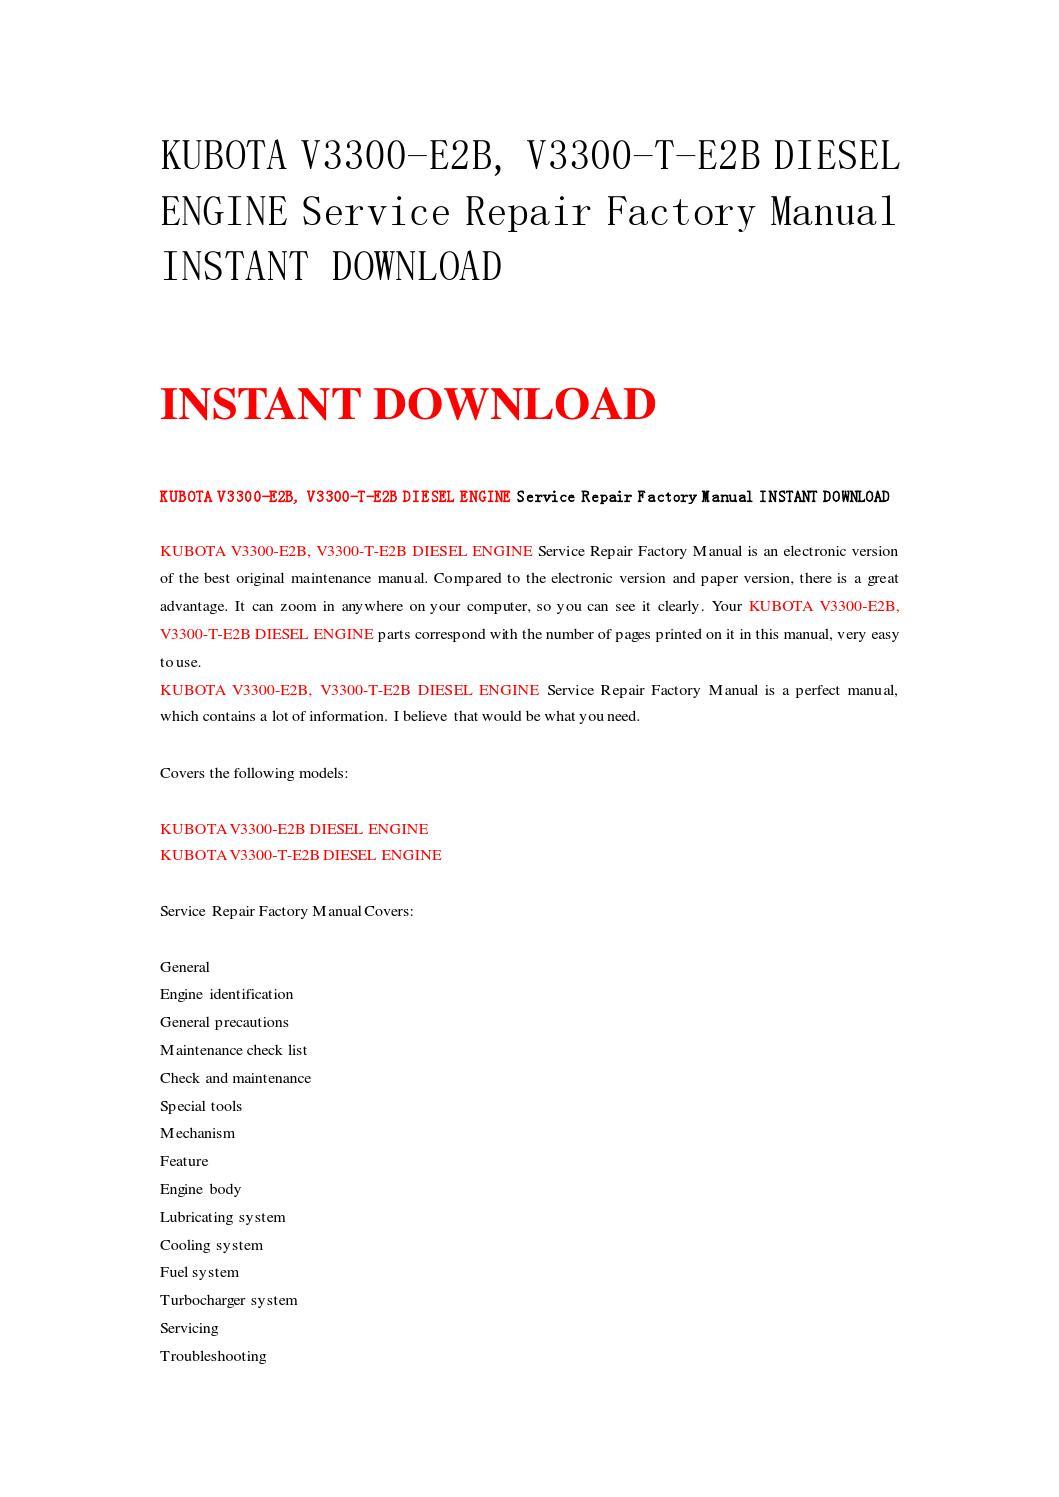 Kubota v3300 e2b, v3300 t e2b diesel engine service repair factory manual  instant download by nwqrez - issuu